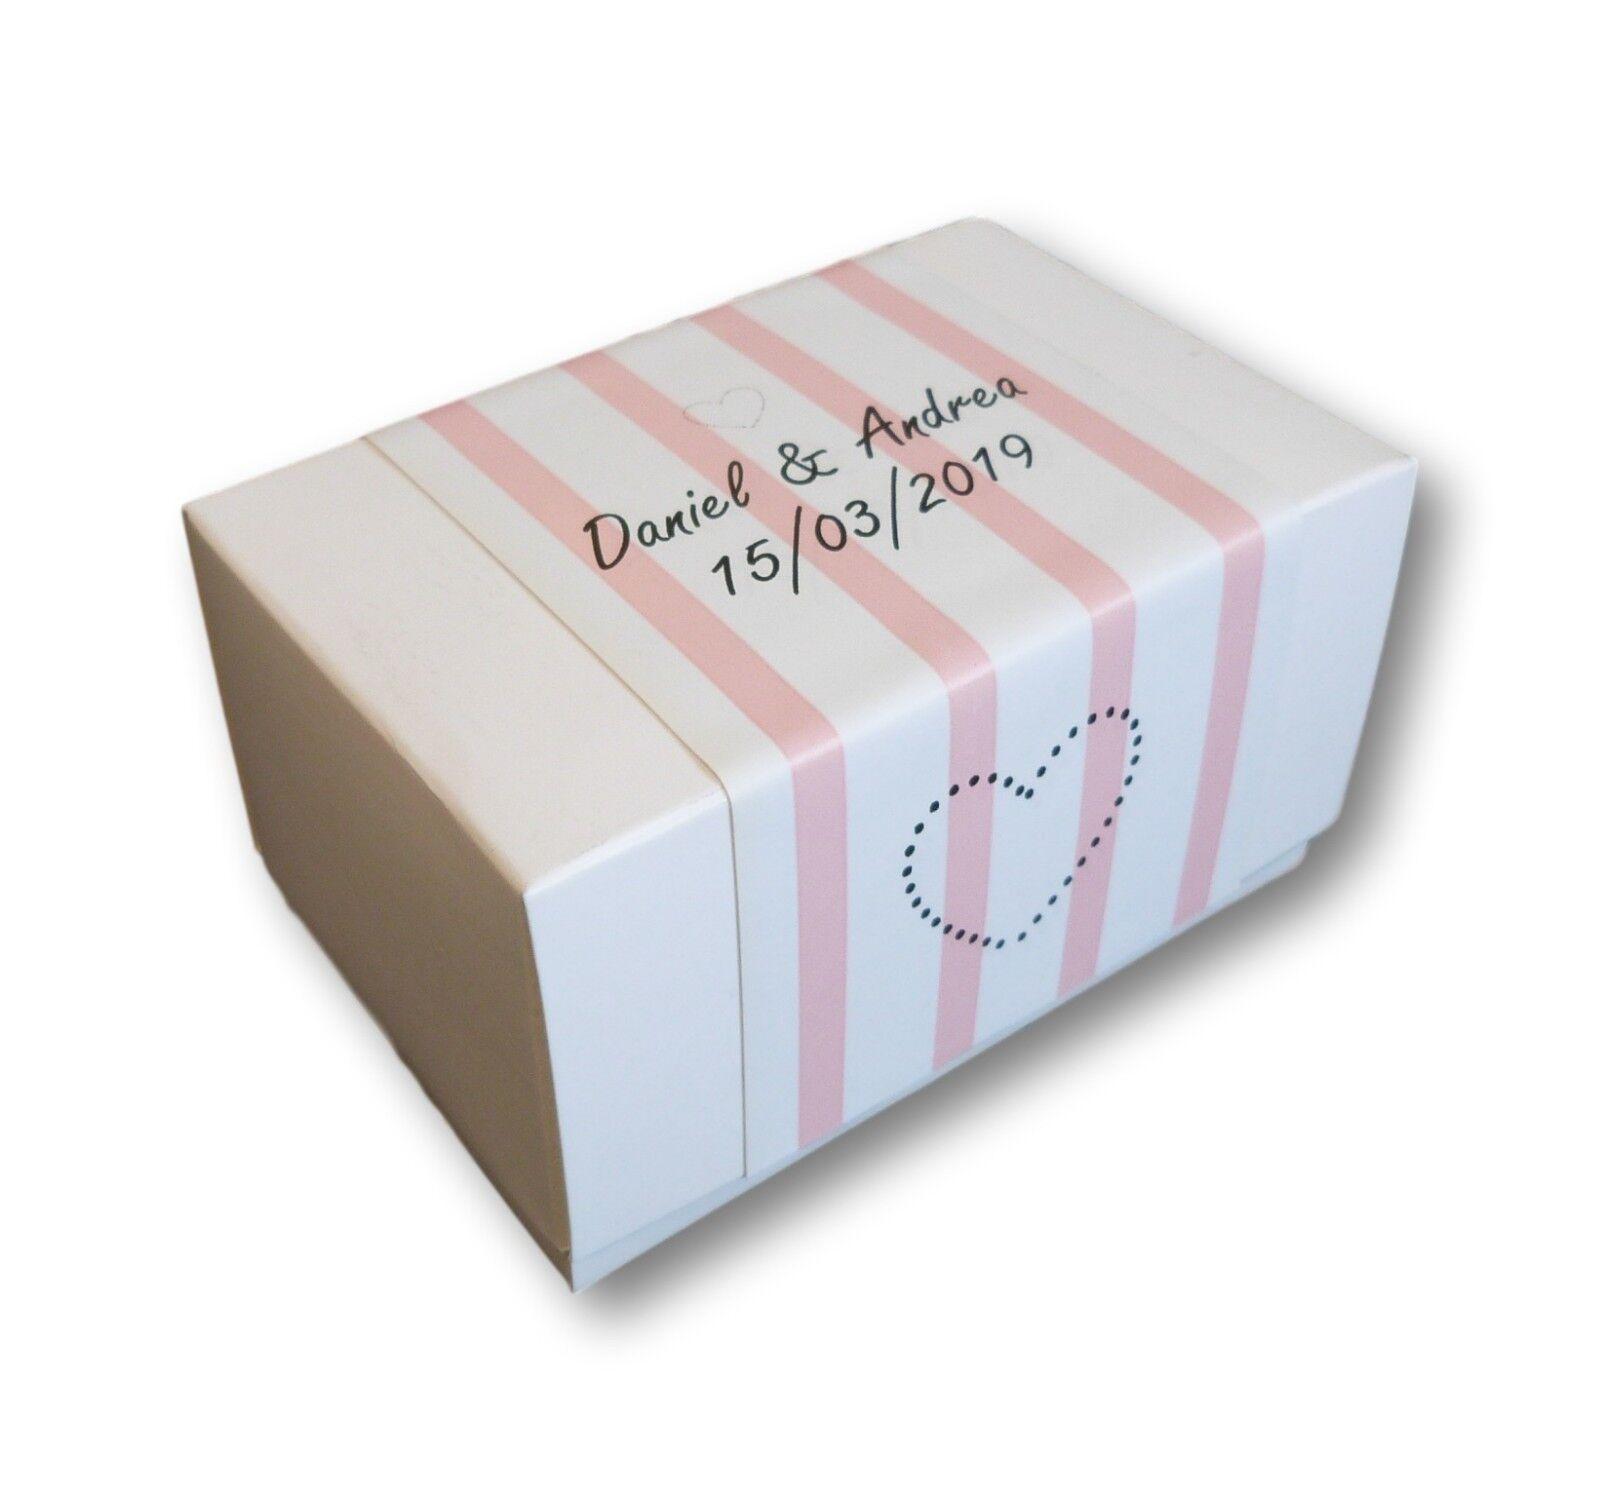 Peachy 20 X Pink S Labels White Box Wedding Birthday Cake Boxes Funny Birthday Cards Online Inifofree Goldxyz